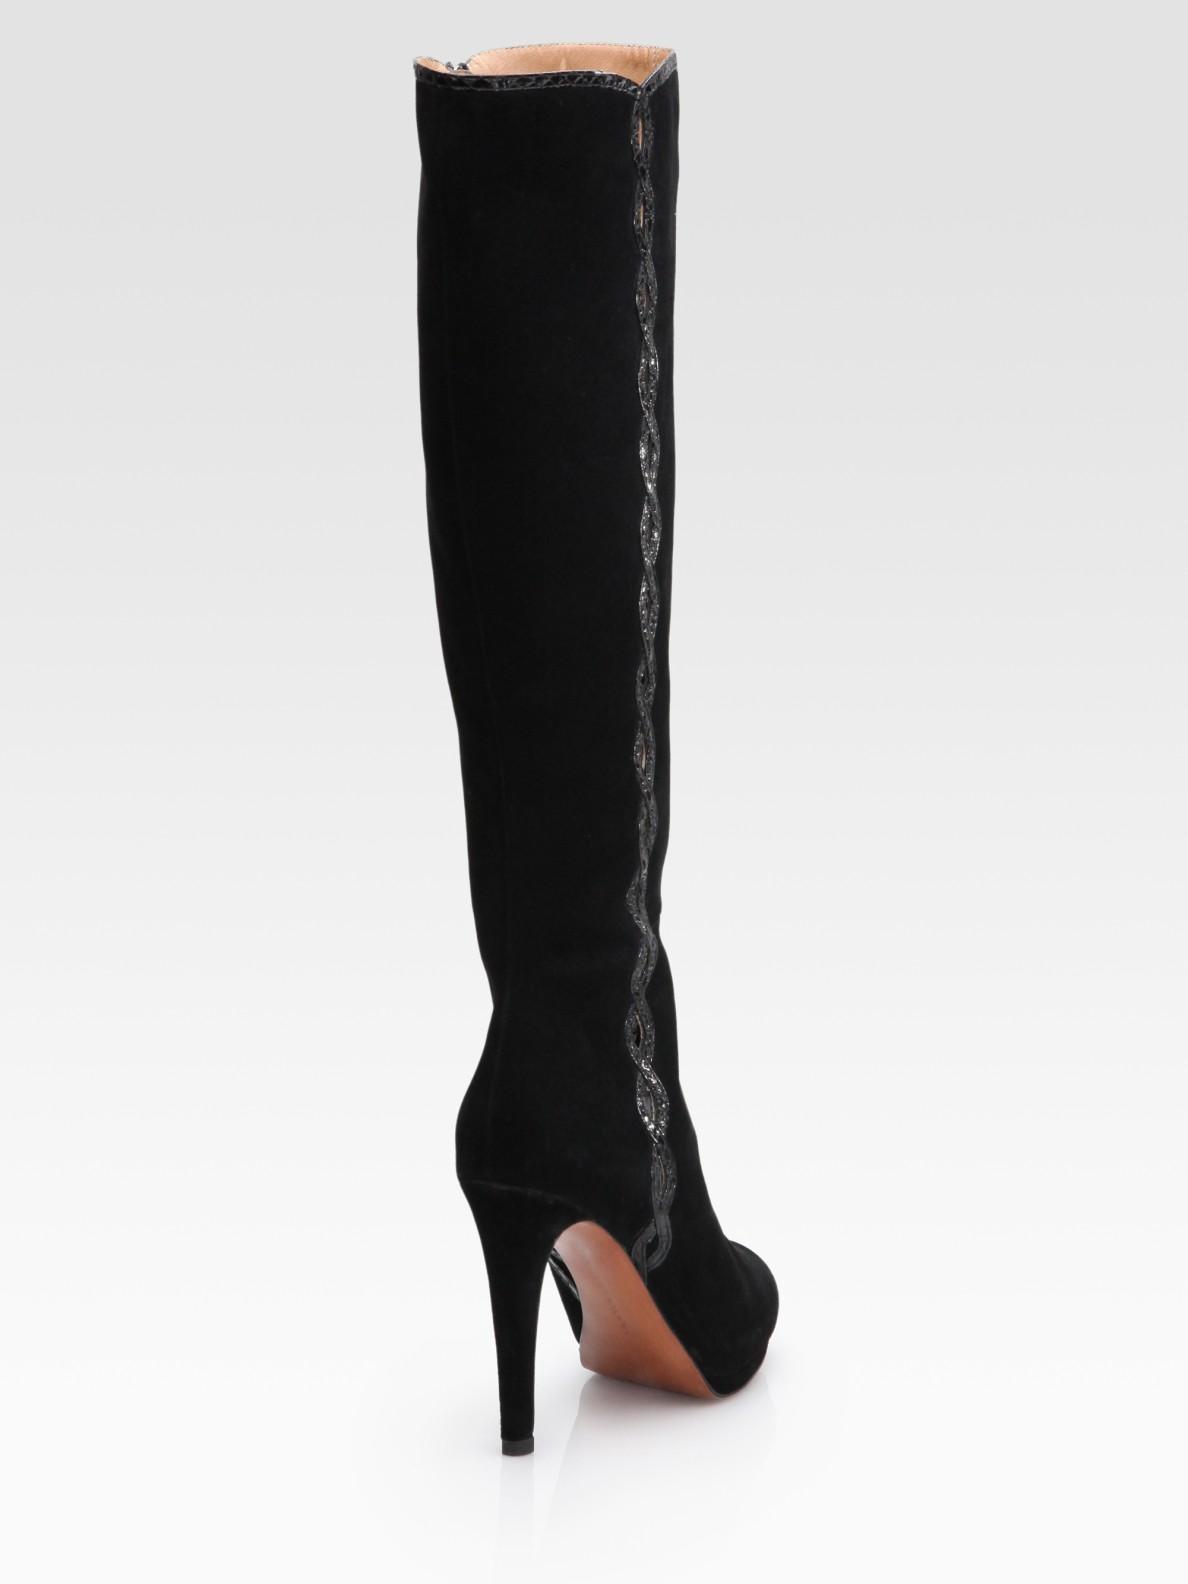 elie tahari barletta suede knee high cutout boots in black